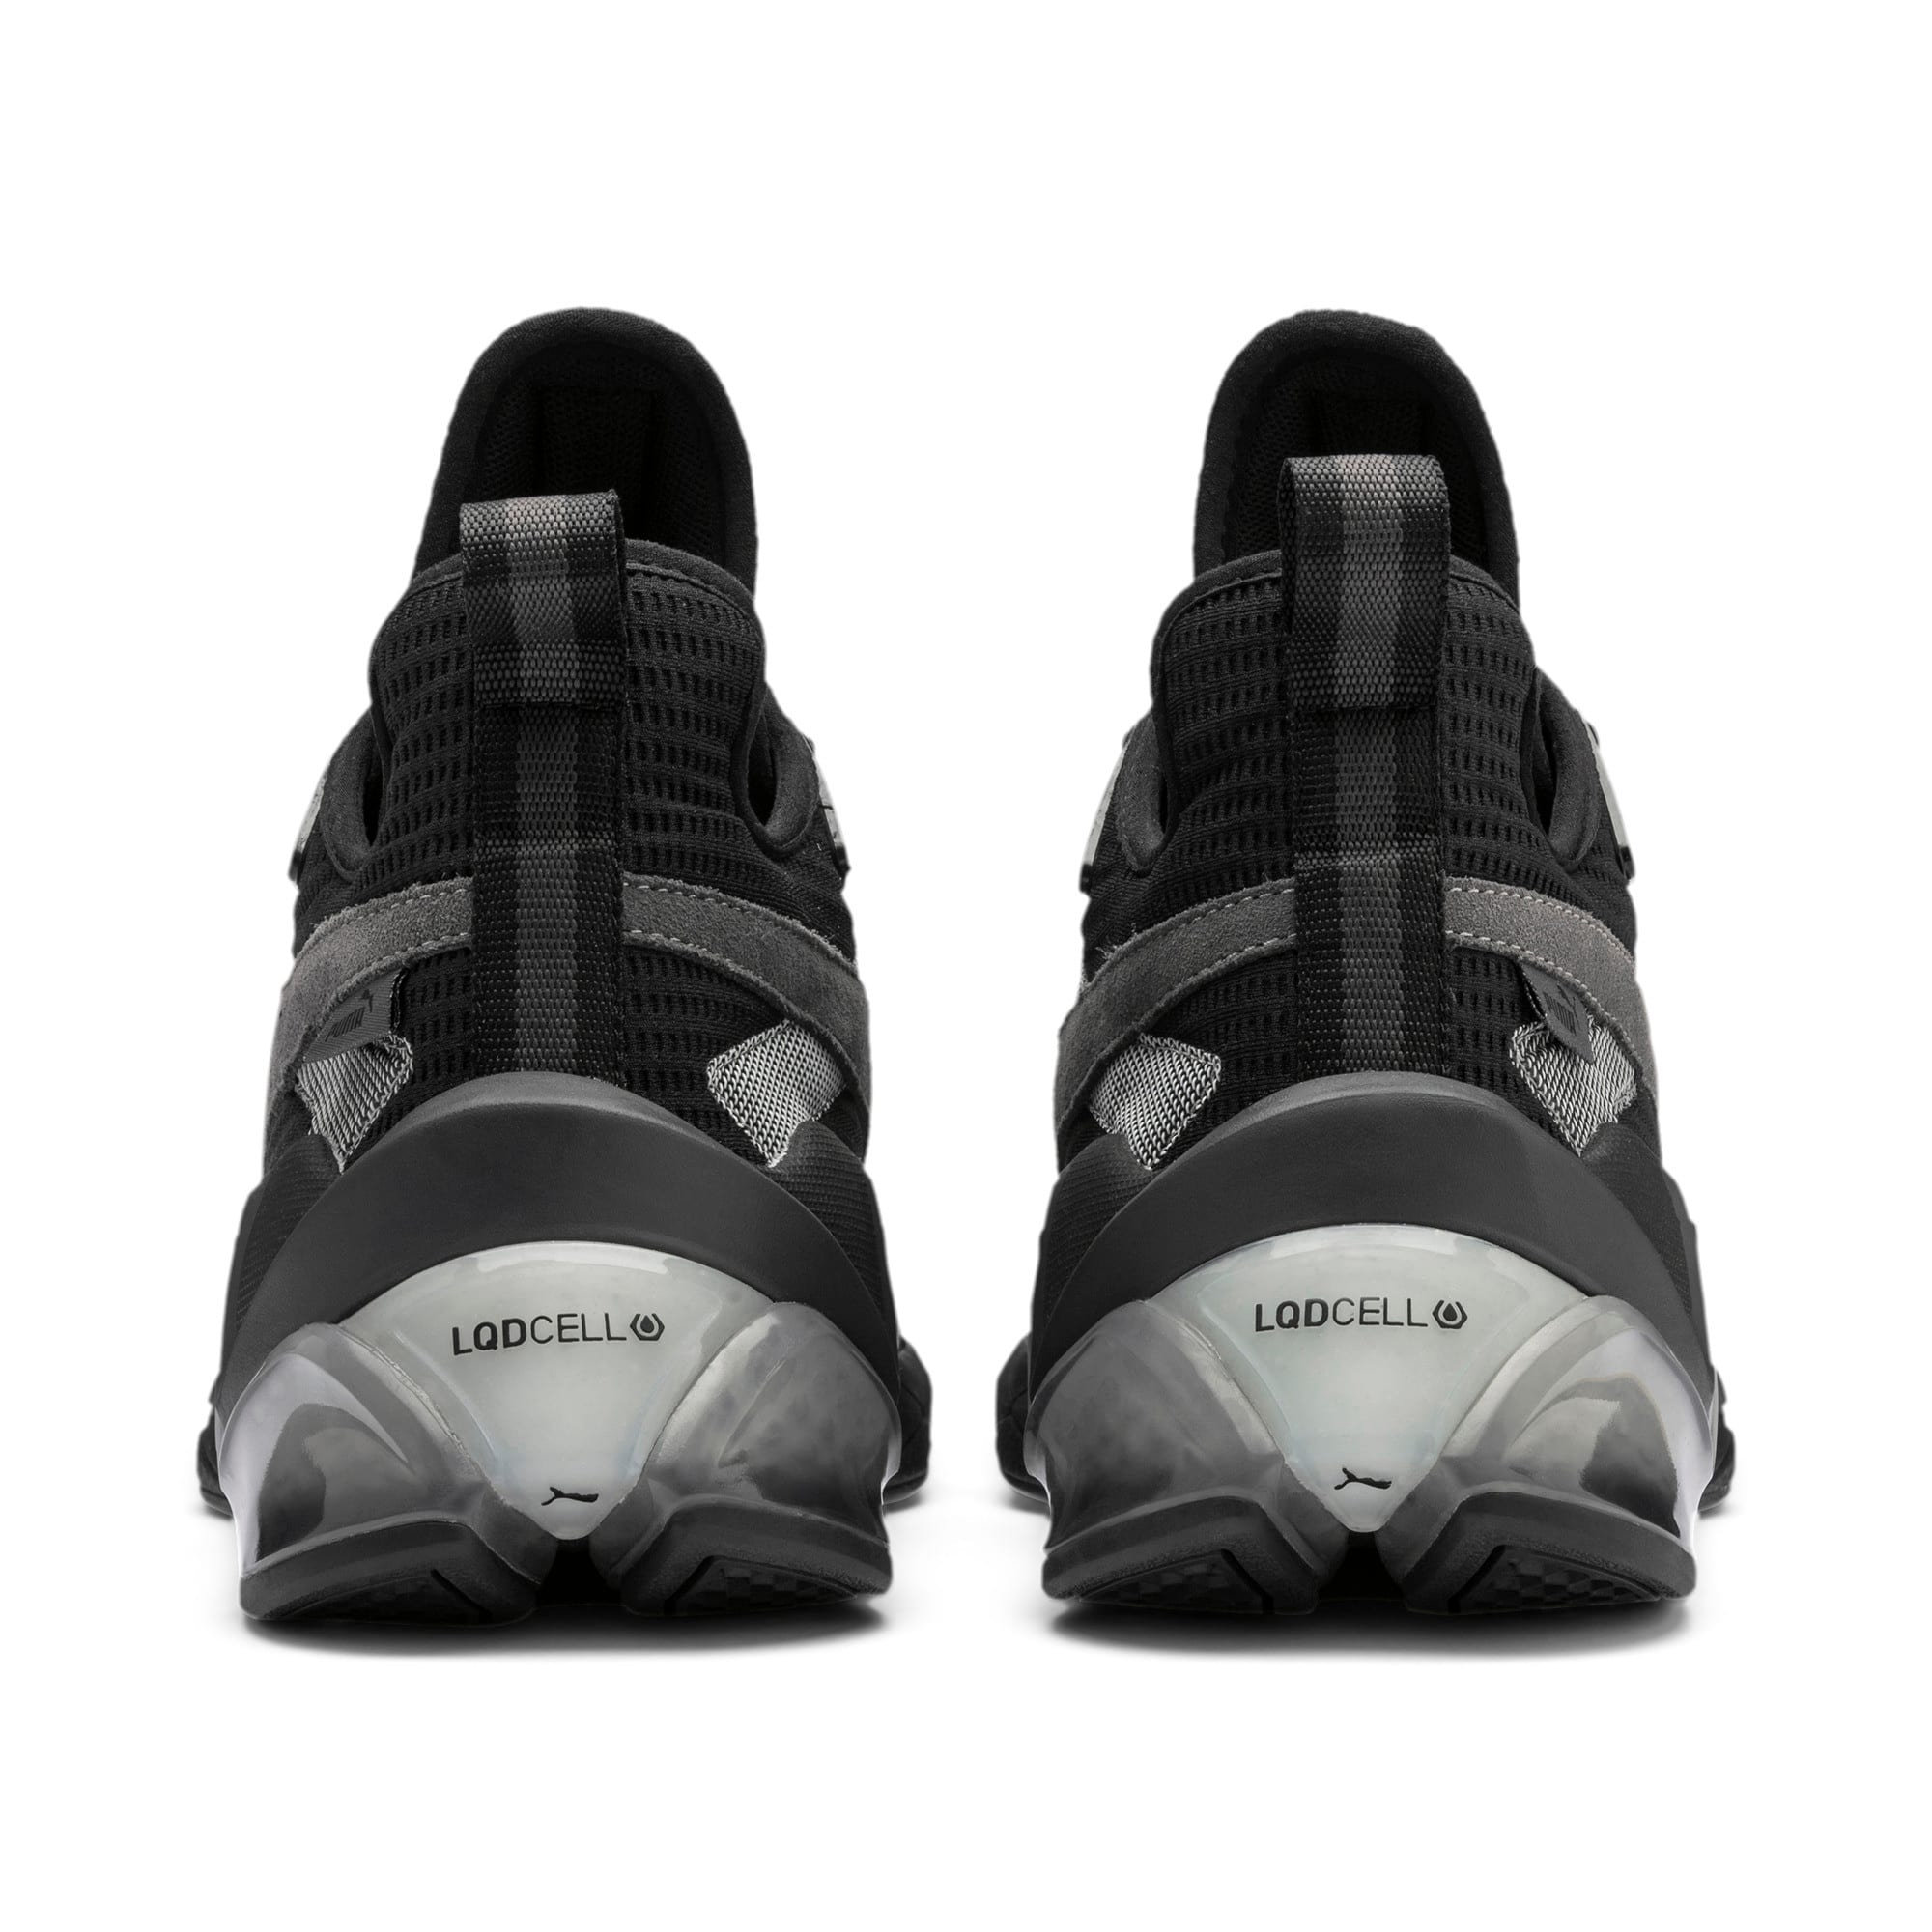 Thumbnail 4 of LQDCELL Origin Men's Training Shoes, Puma Black-Asphalt, medium